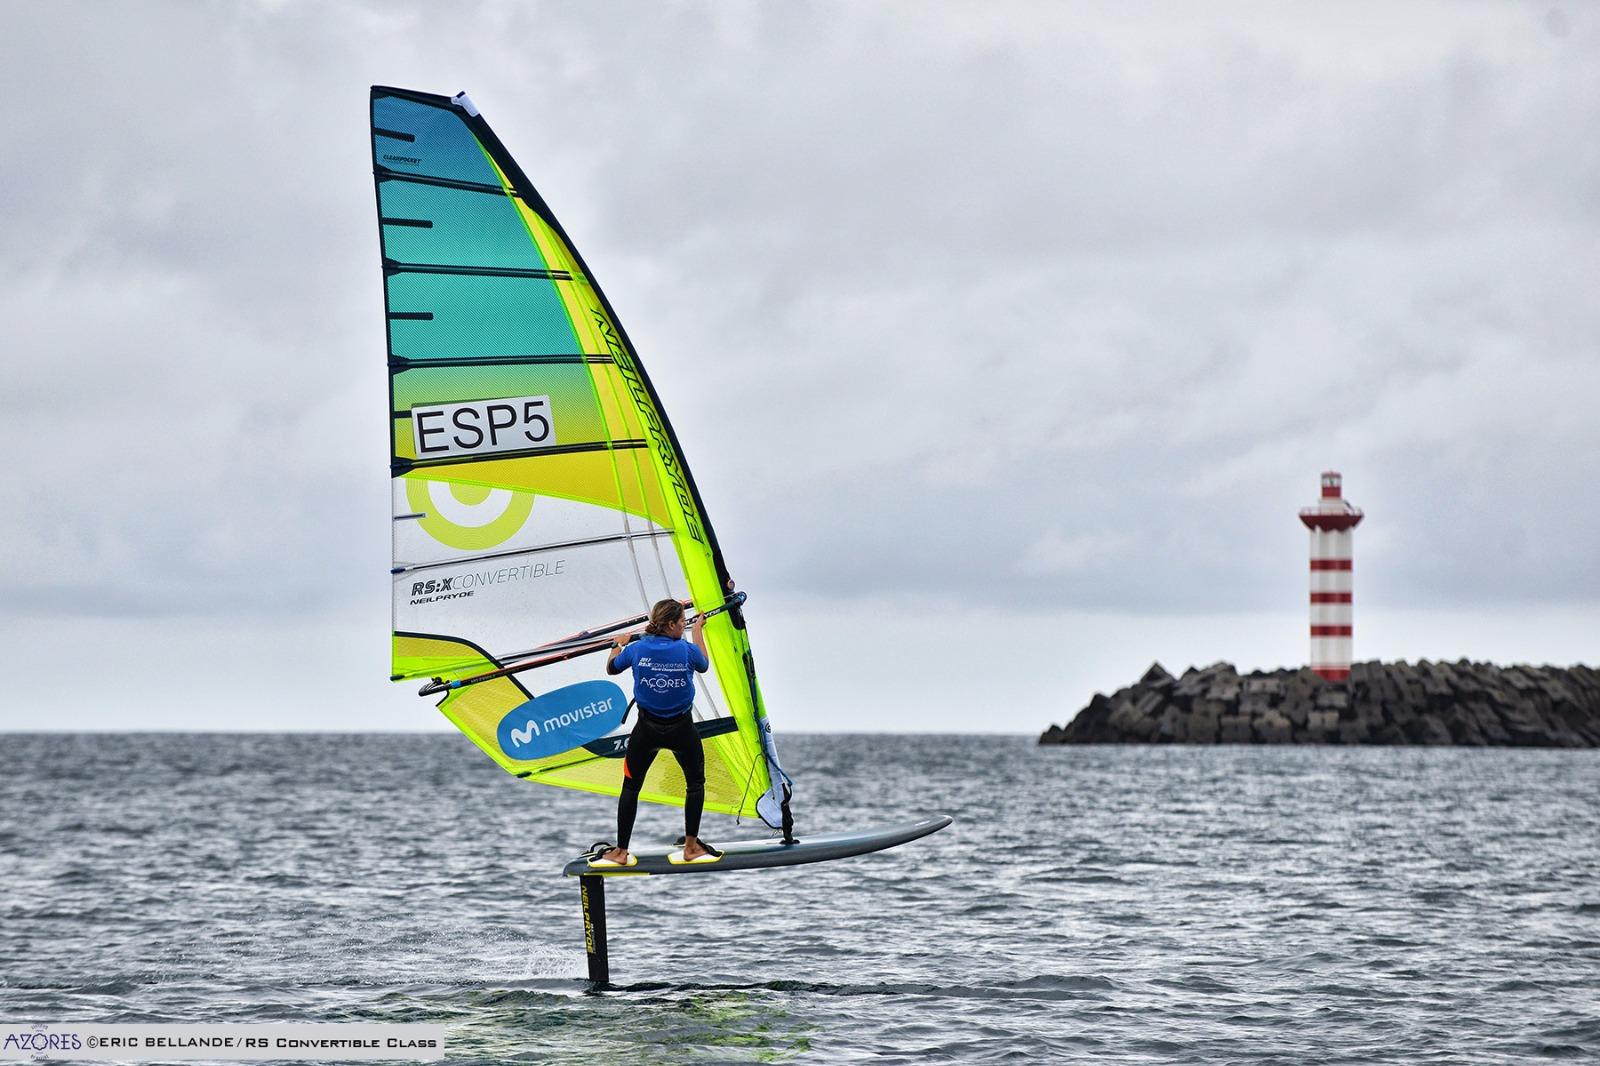 ¡Subcampeona del primer Mundial de windsurf con foil!